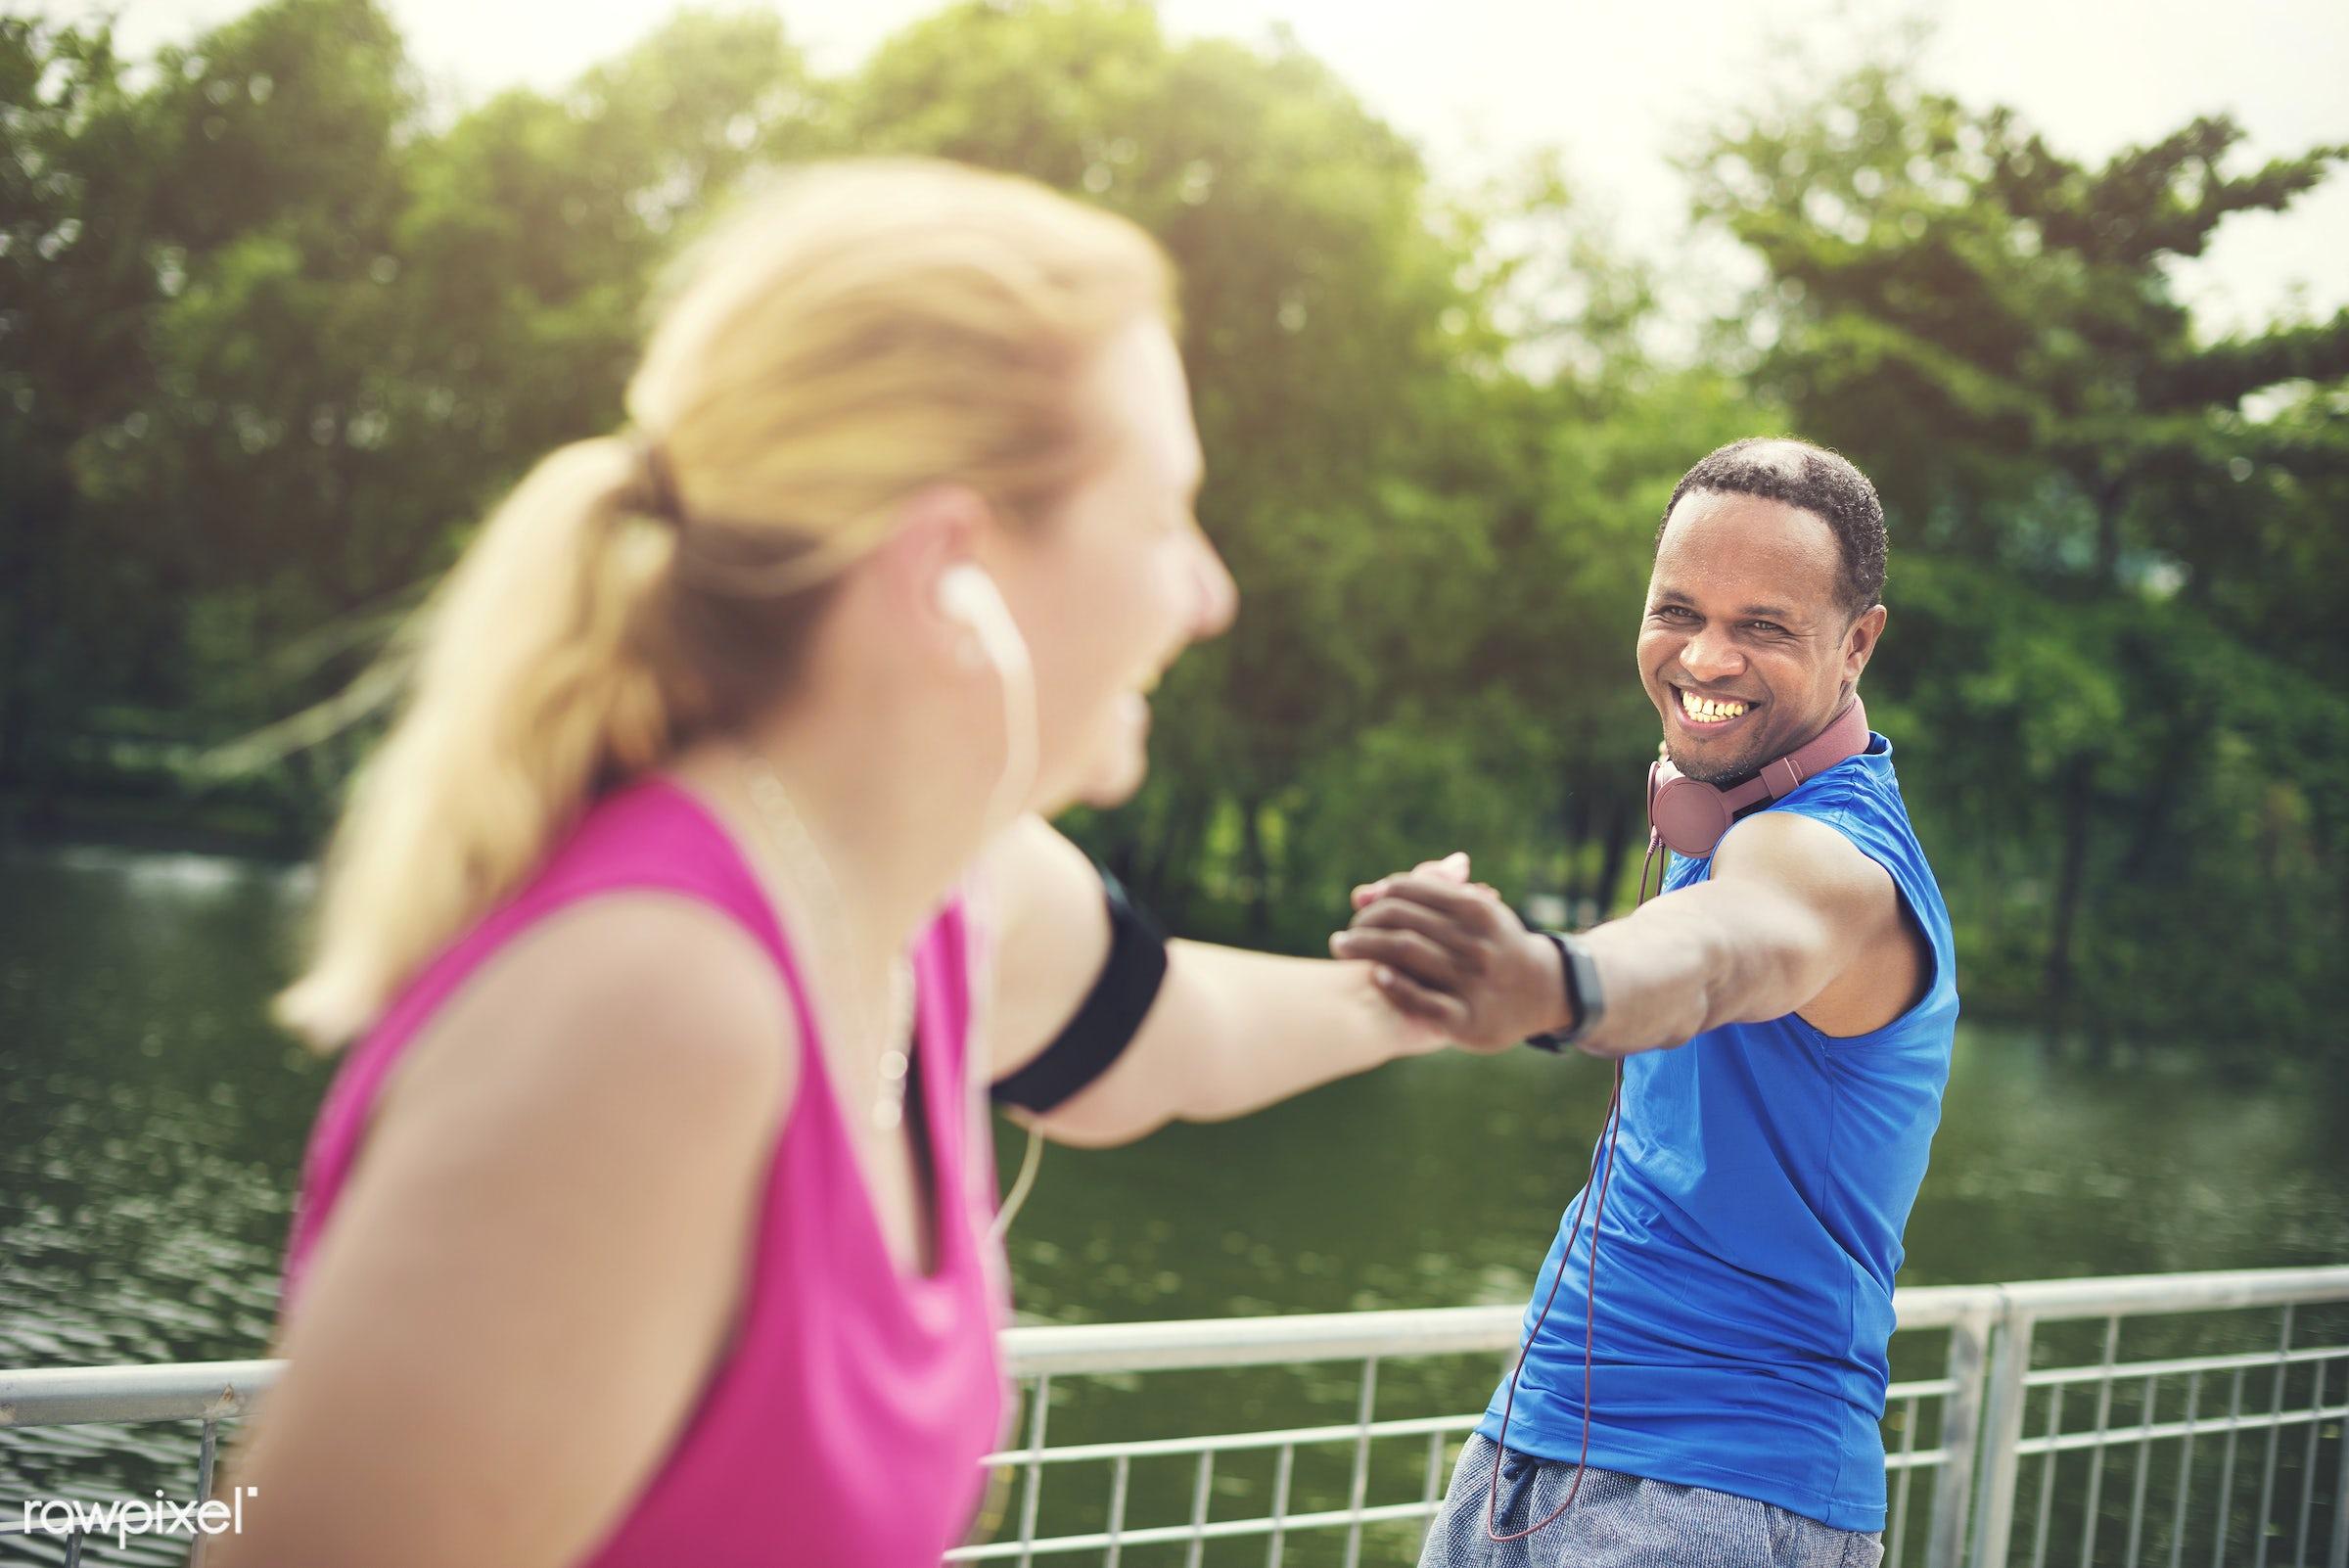 african, african descent, bonding, caucasian, cheerful, clothing, couple, earphone, exercise, fitness, form, garden, green,...